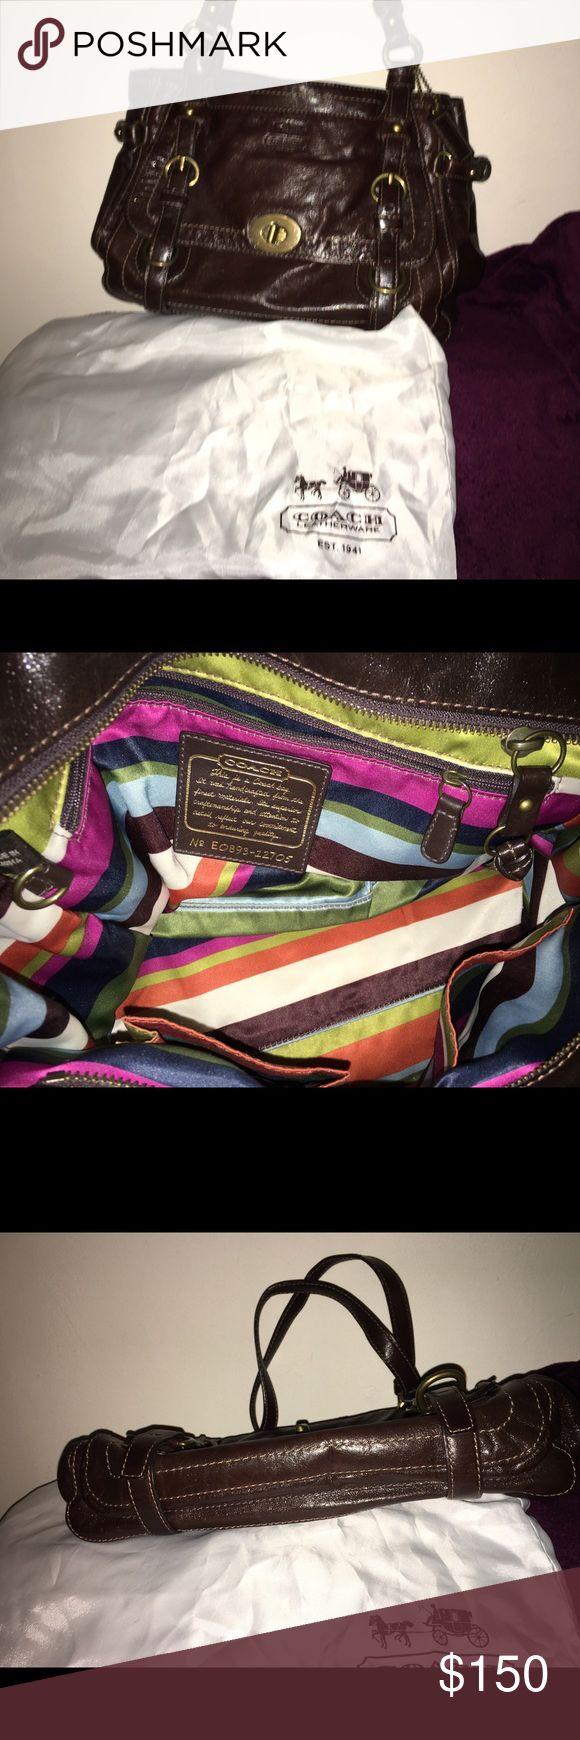 Coach LEGACY GARCIA  Brown Leather Bag Purse. Brand new Authentic Coach Leather Bag Purse. Coach Bags Shoulder Bags